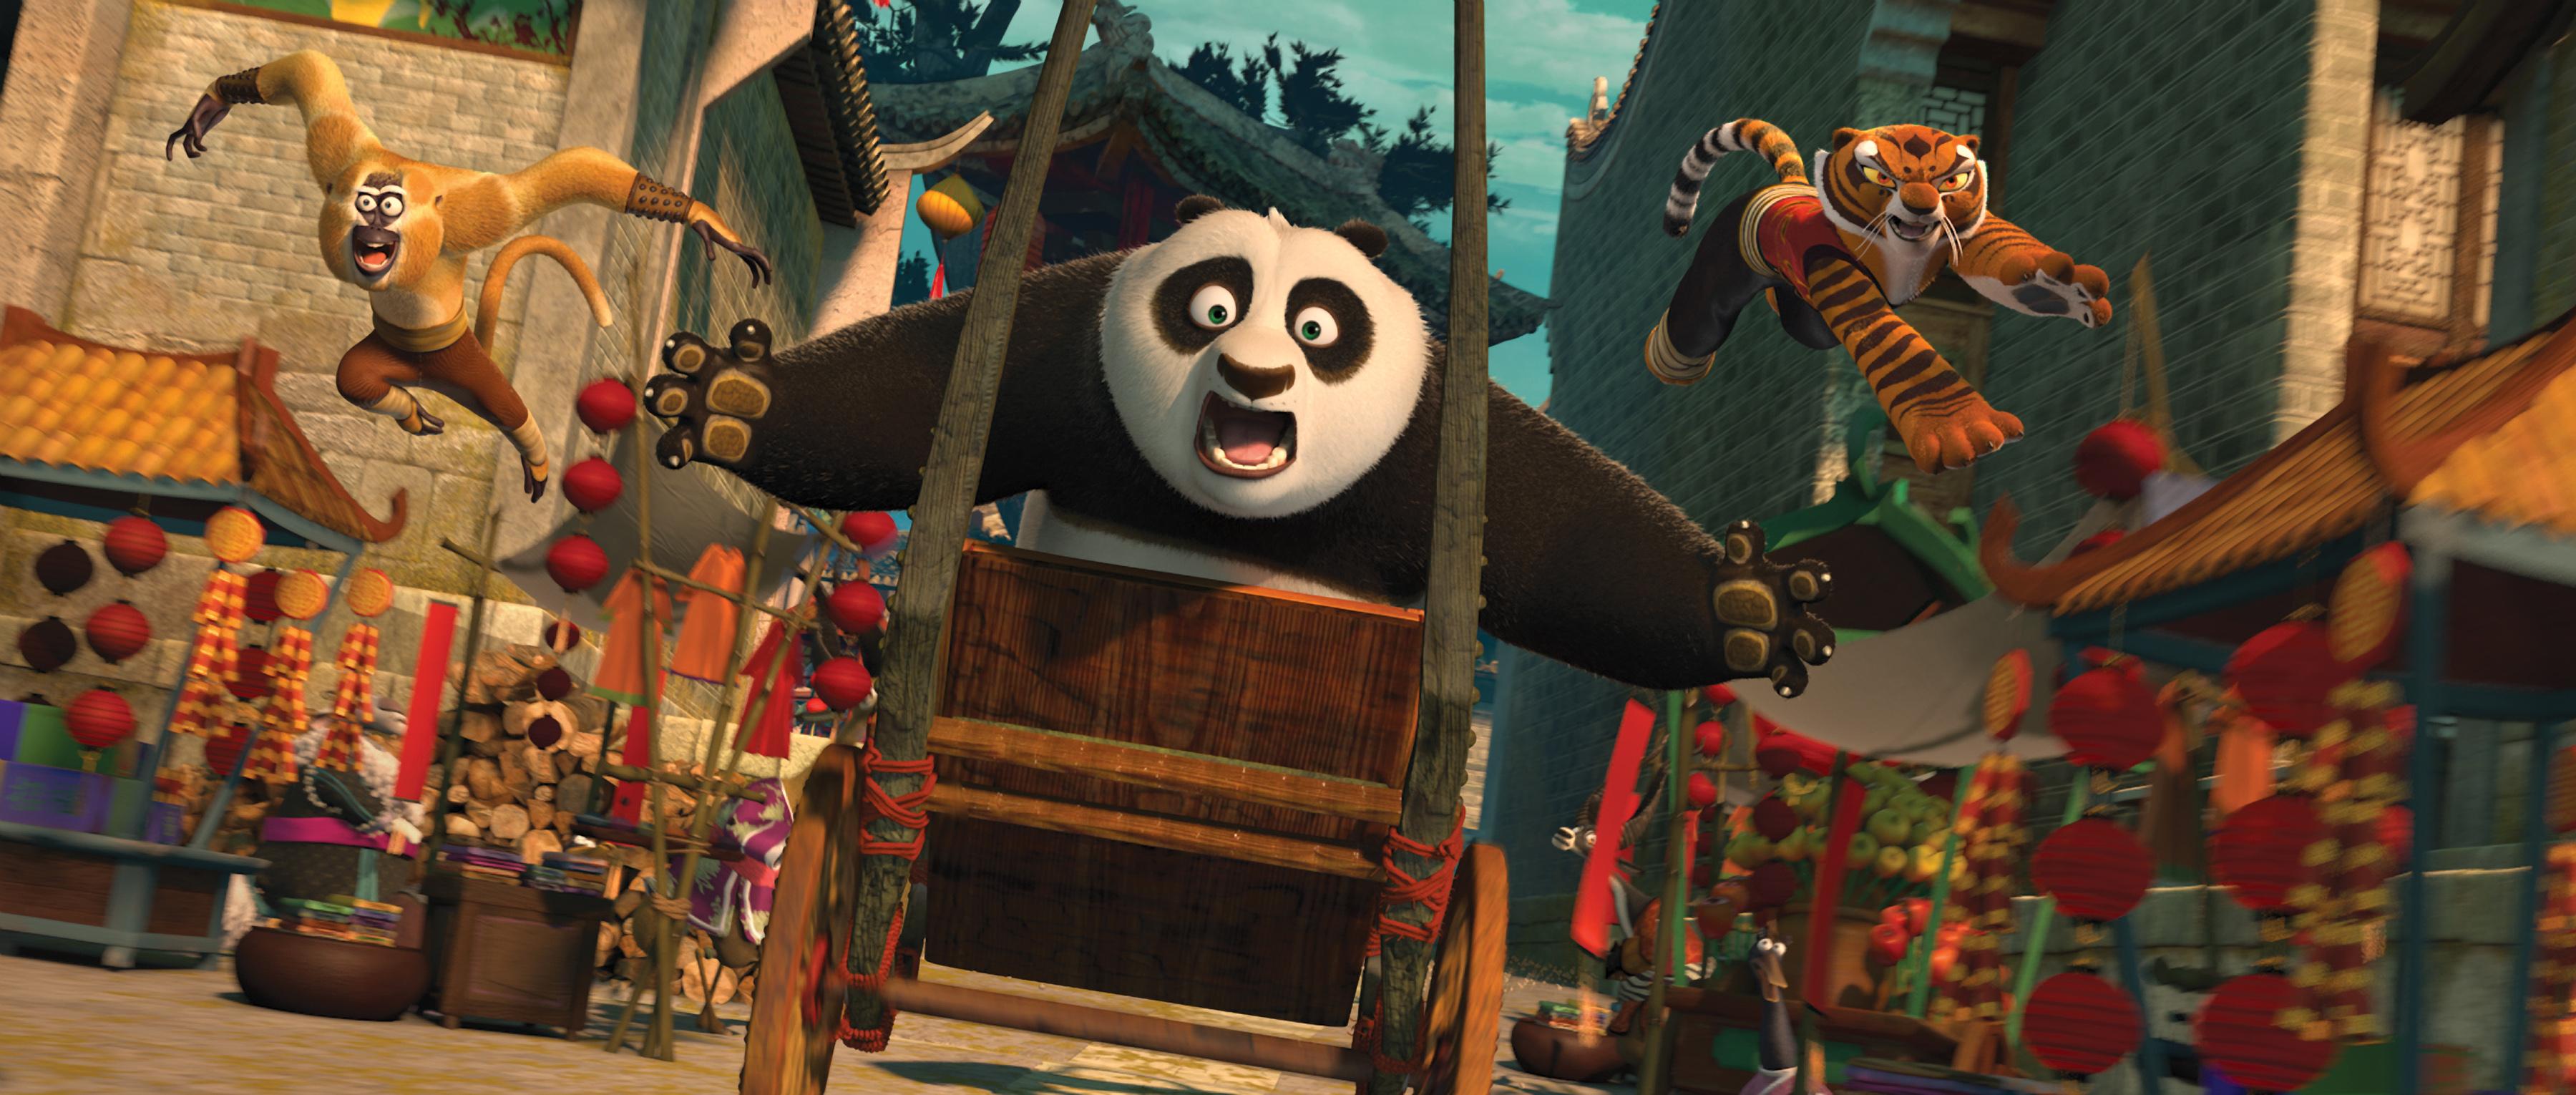 kung-fu-panda-2_6e7d3e28